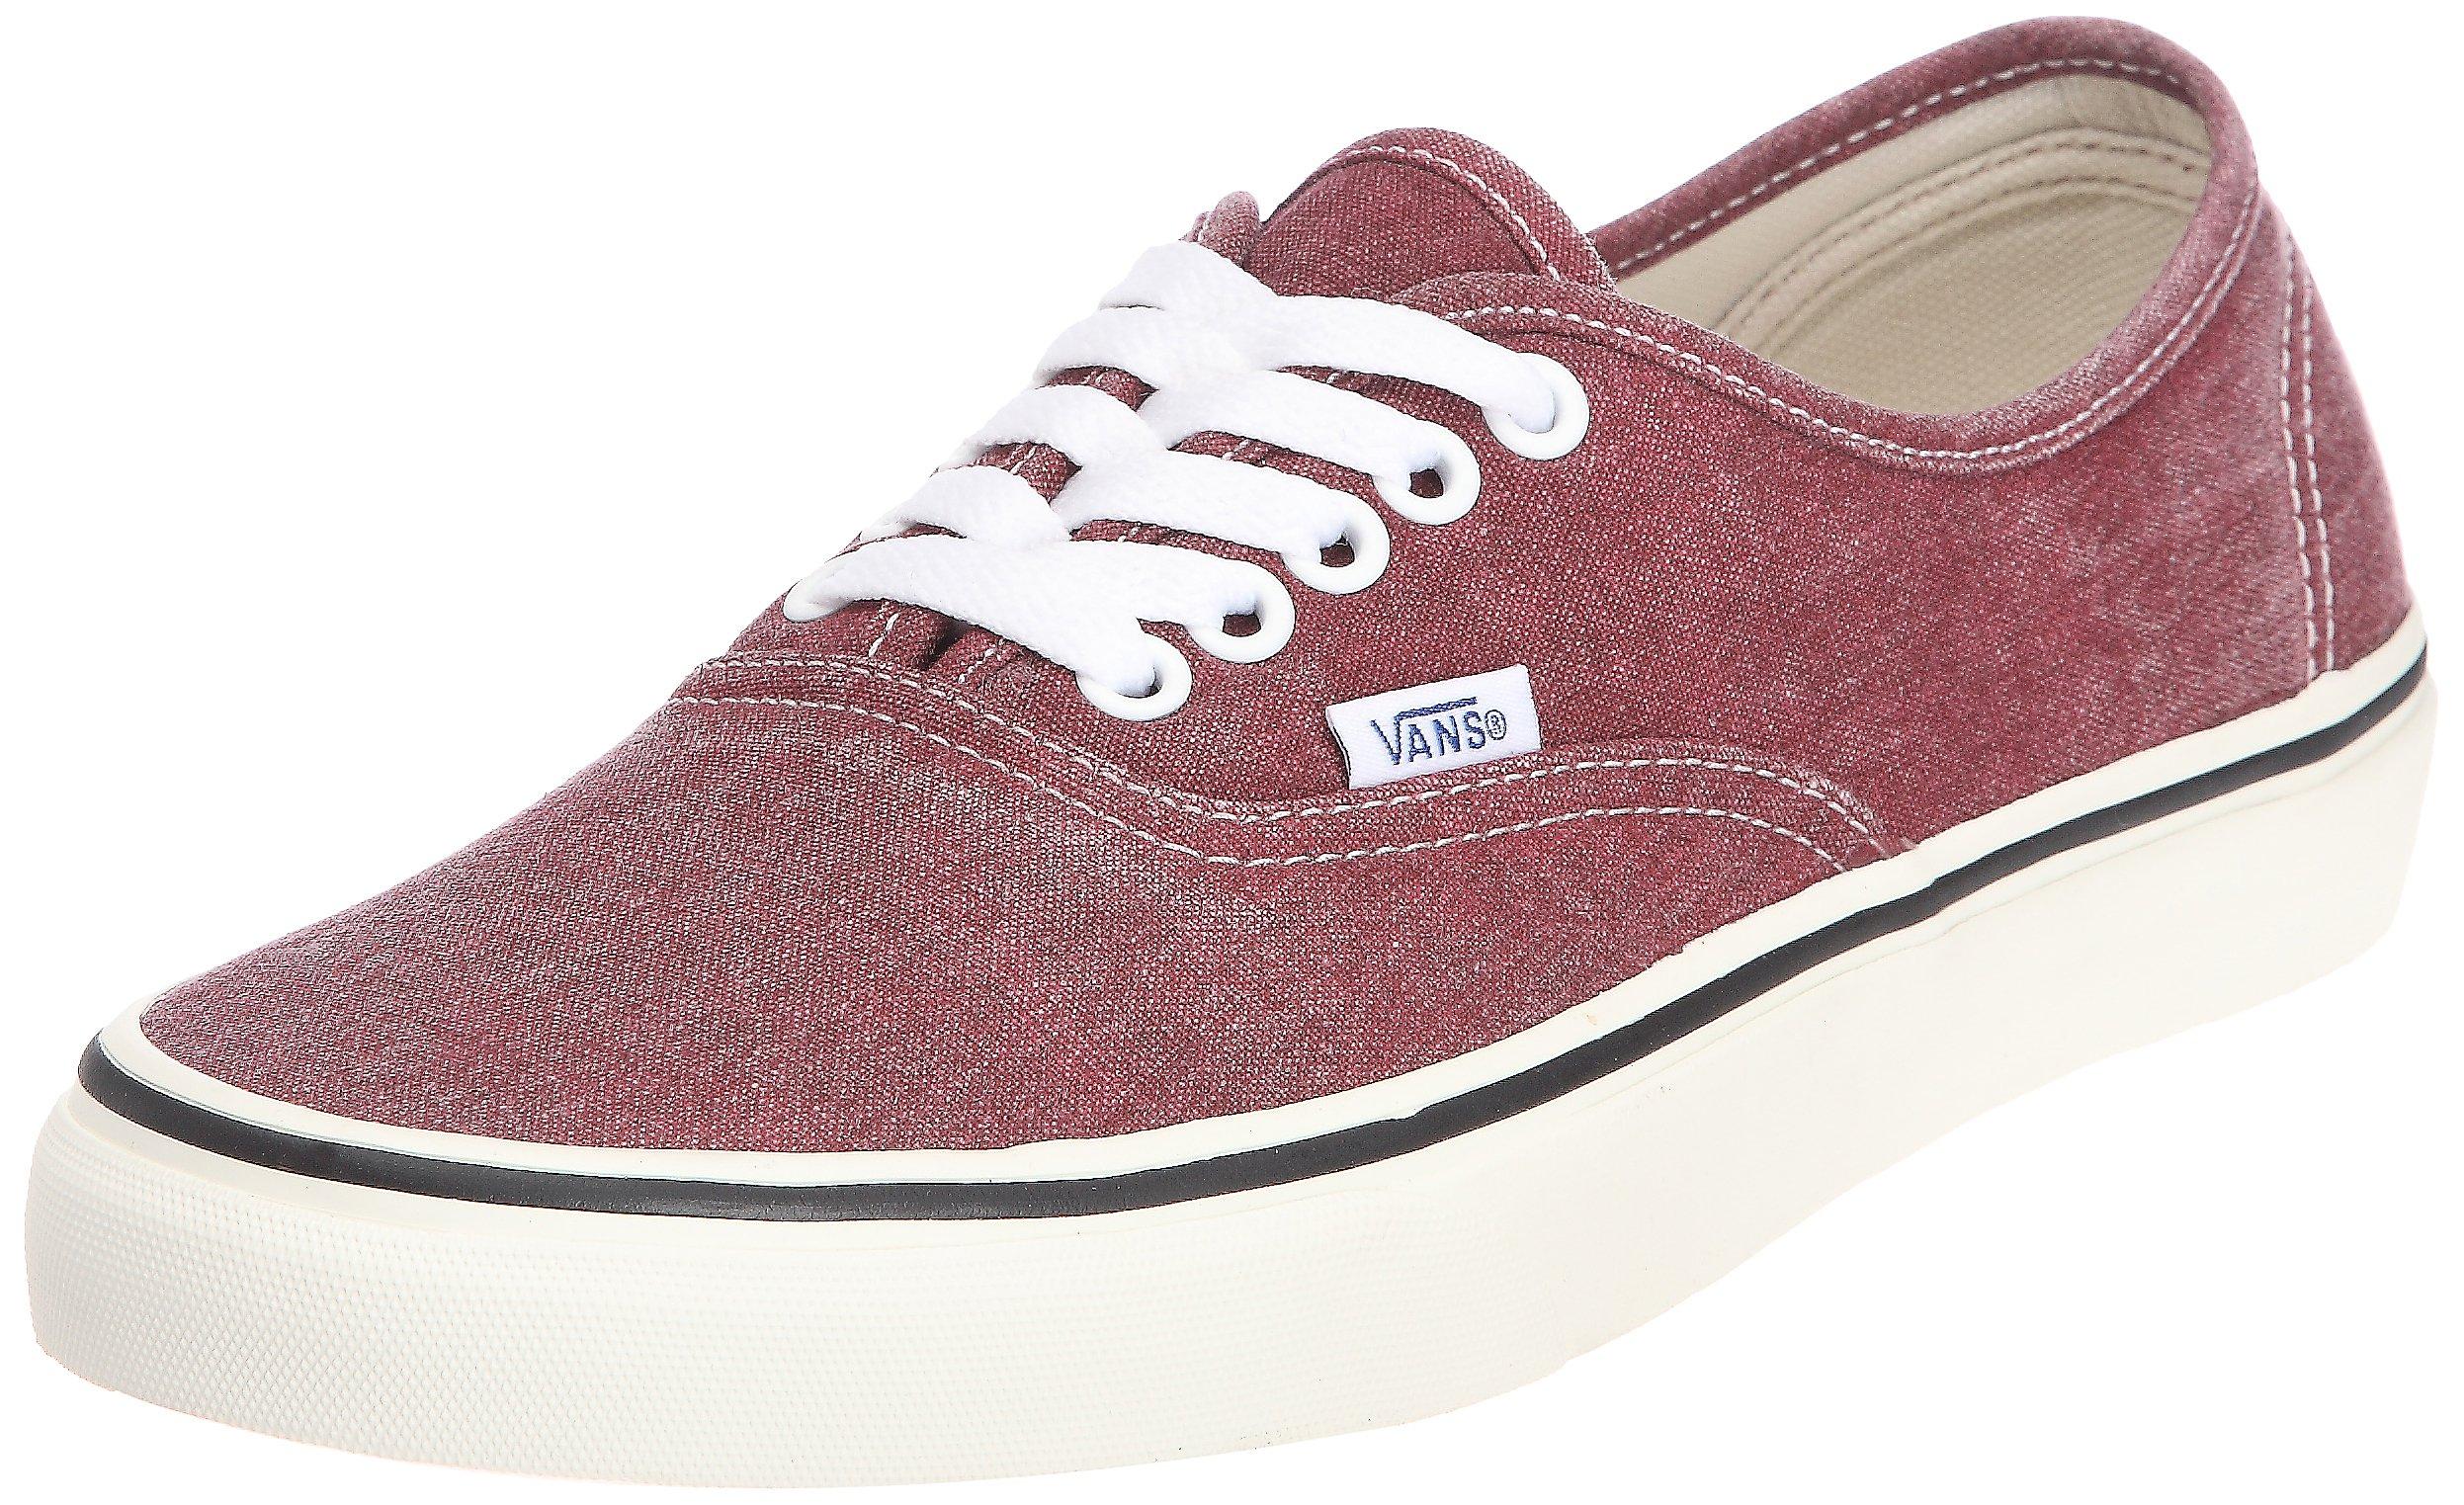 Vans Unisex – Bimbi 0-24 Authentic Scarpe da skate rosso Size: 5 D(M) US